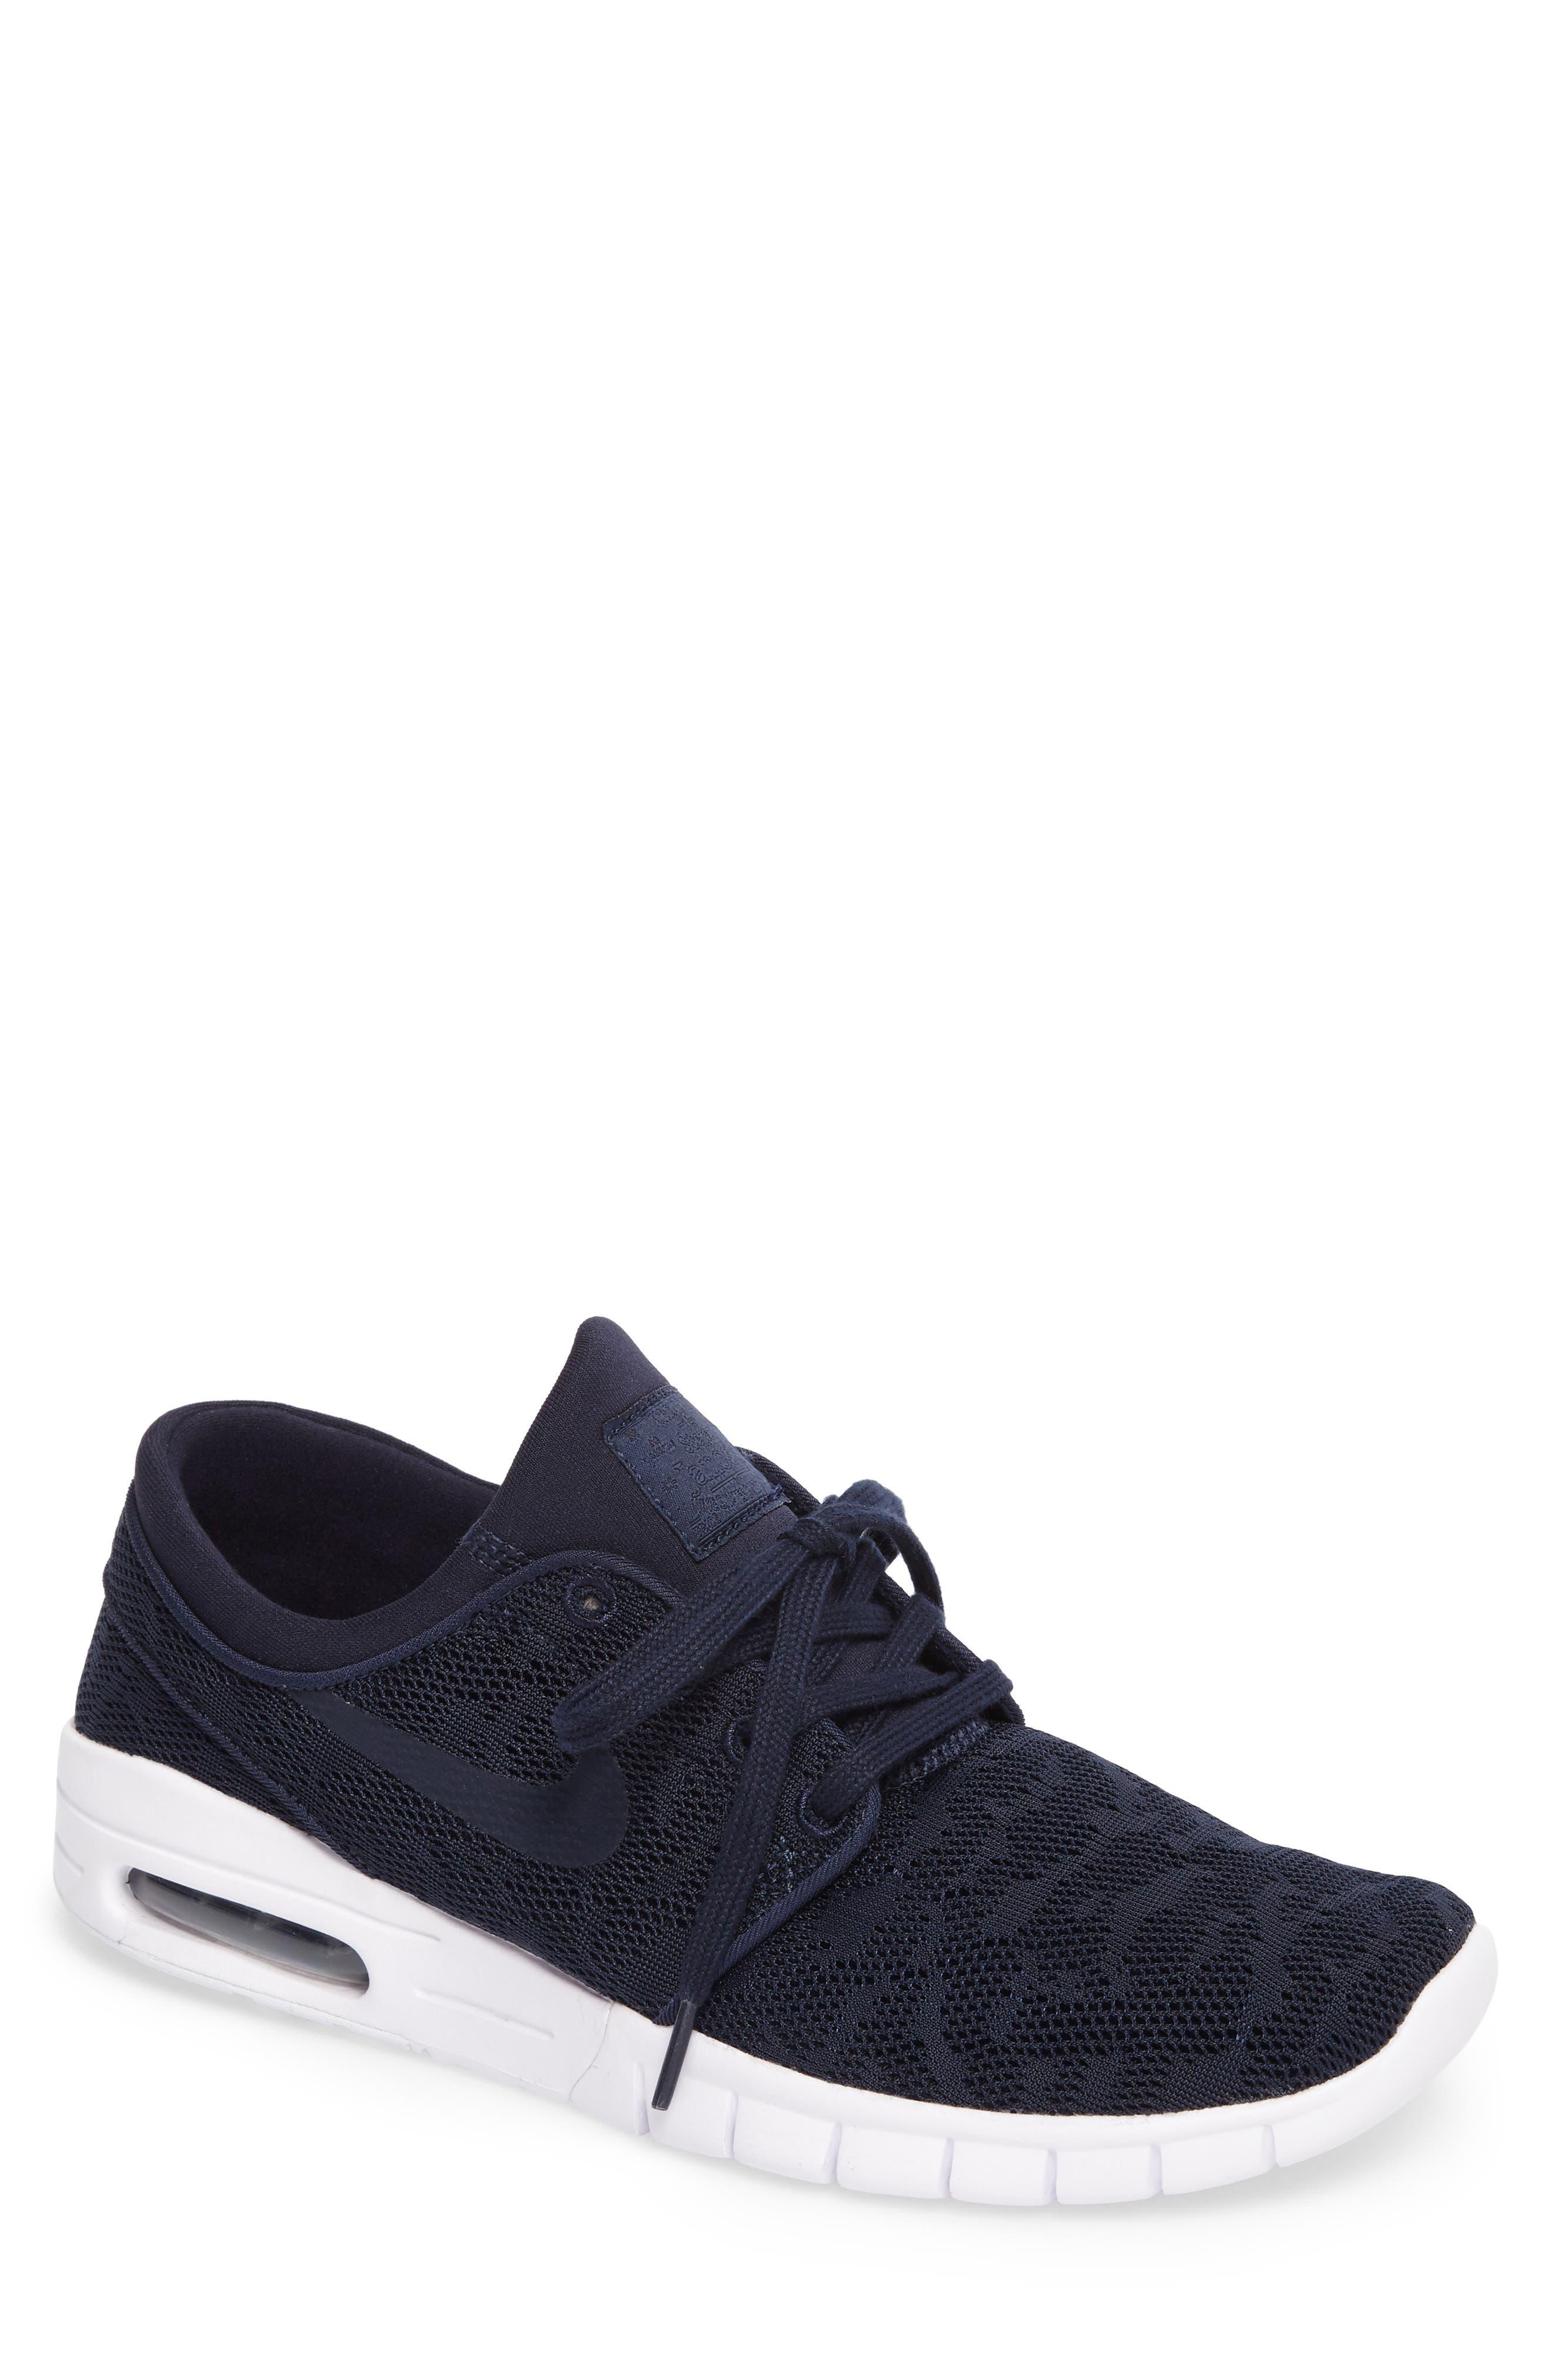 Main Image - Nike 'Stefan Janoski - Max SB' Skate Shoe (Men)